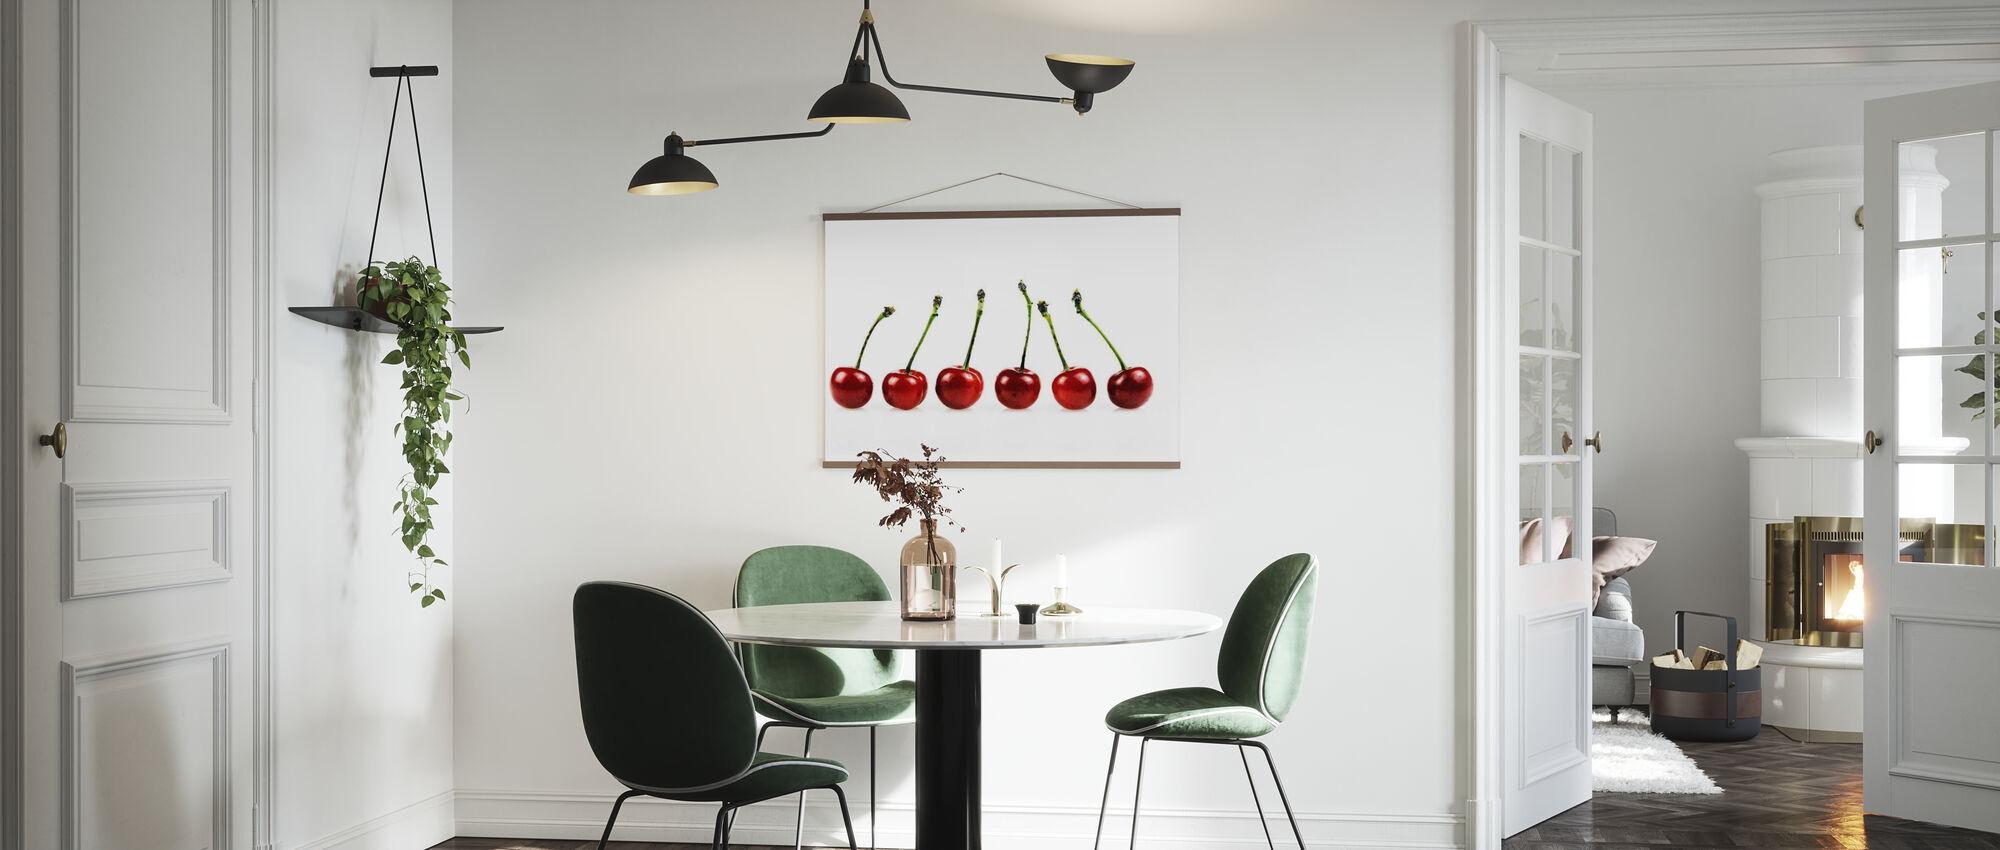 Fresh Cherries - Poster - Kitchen